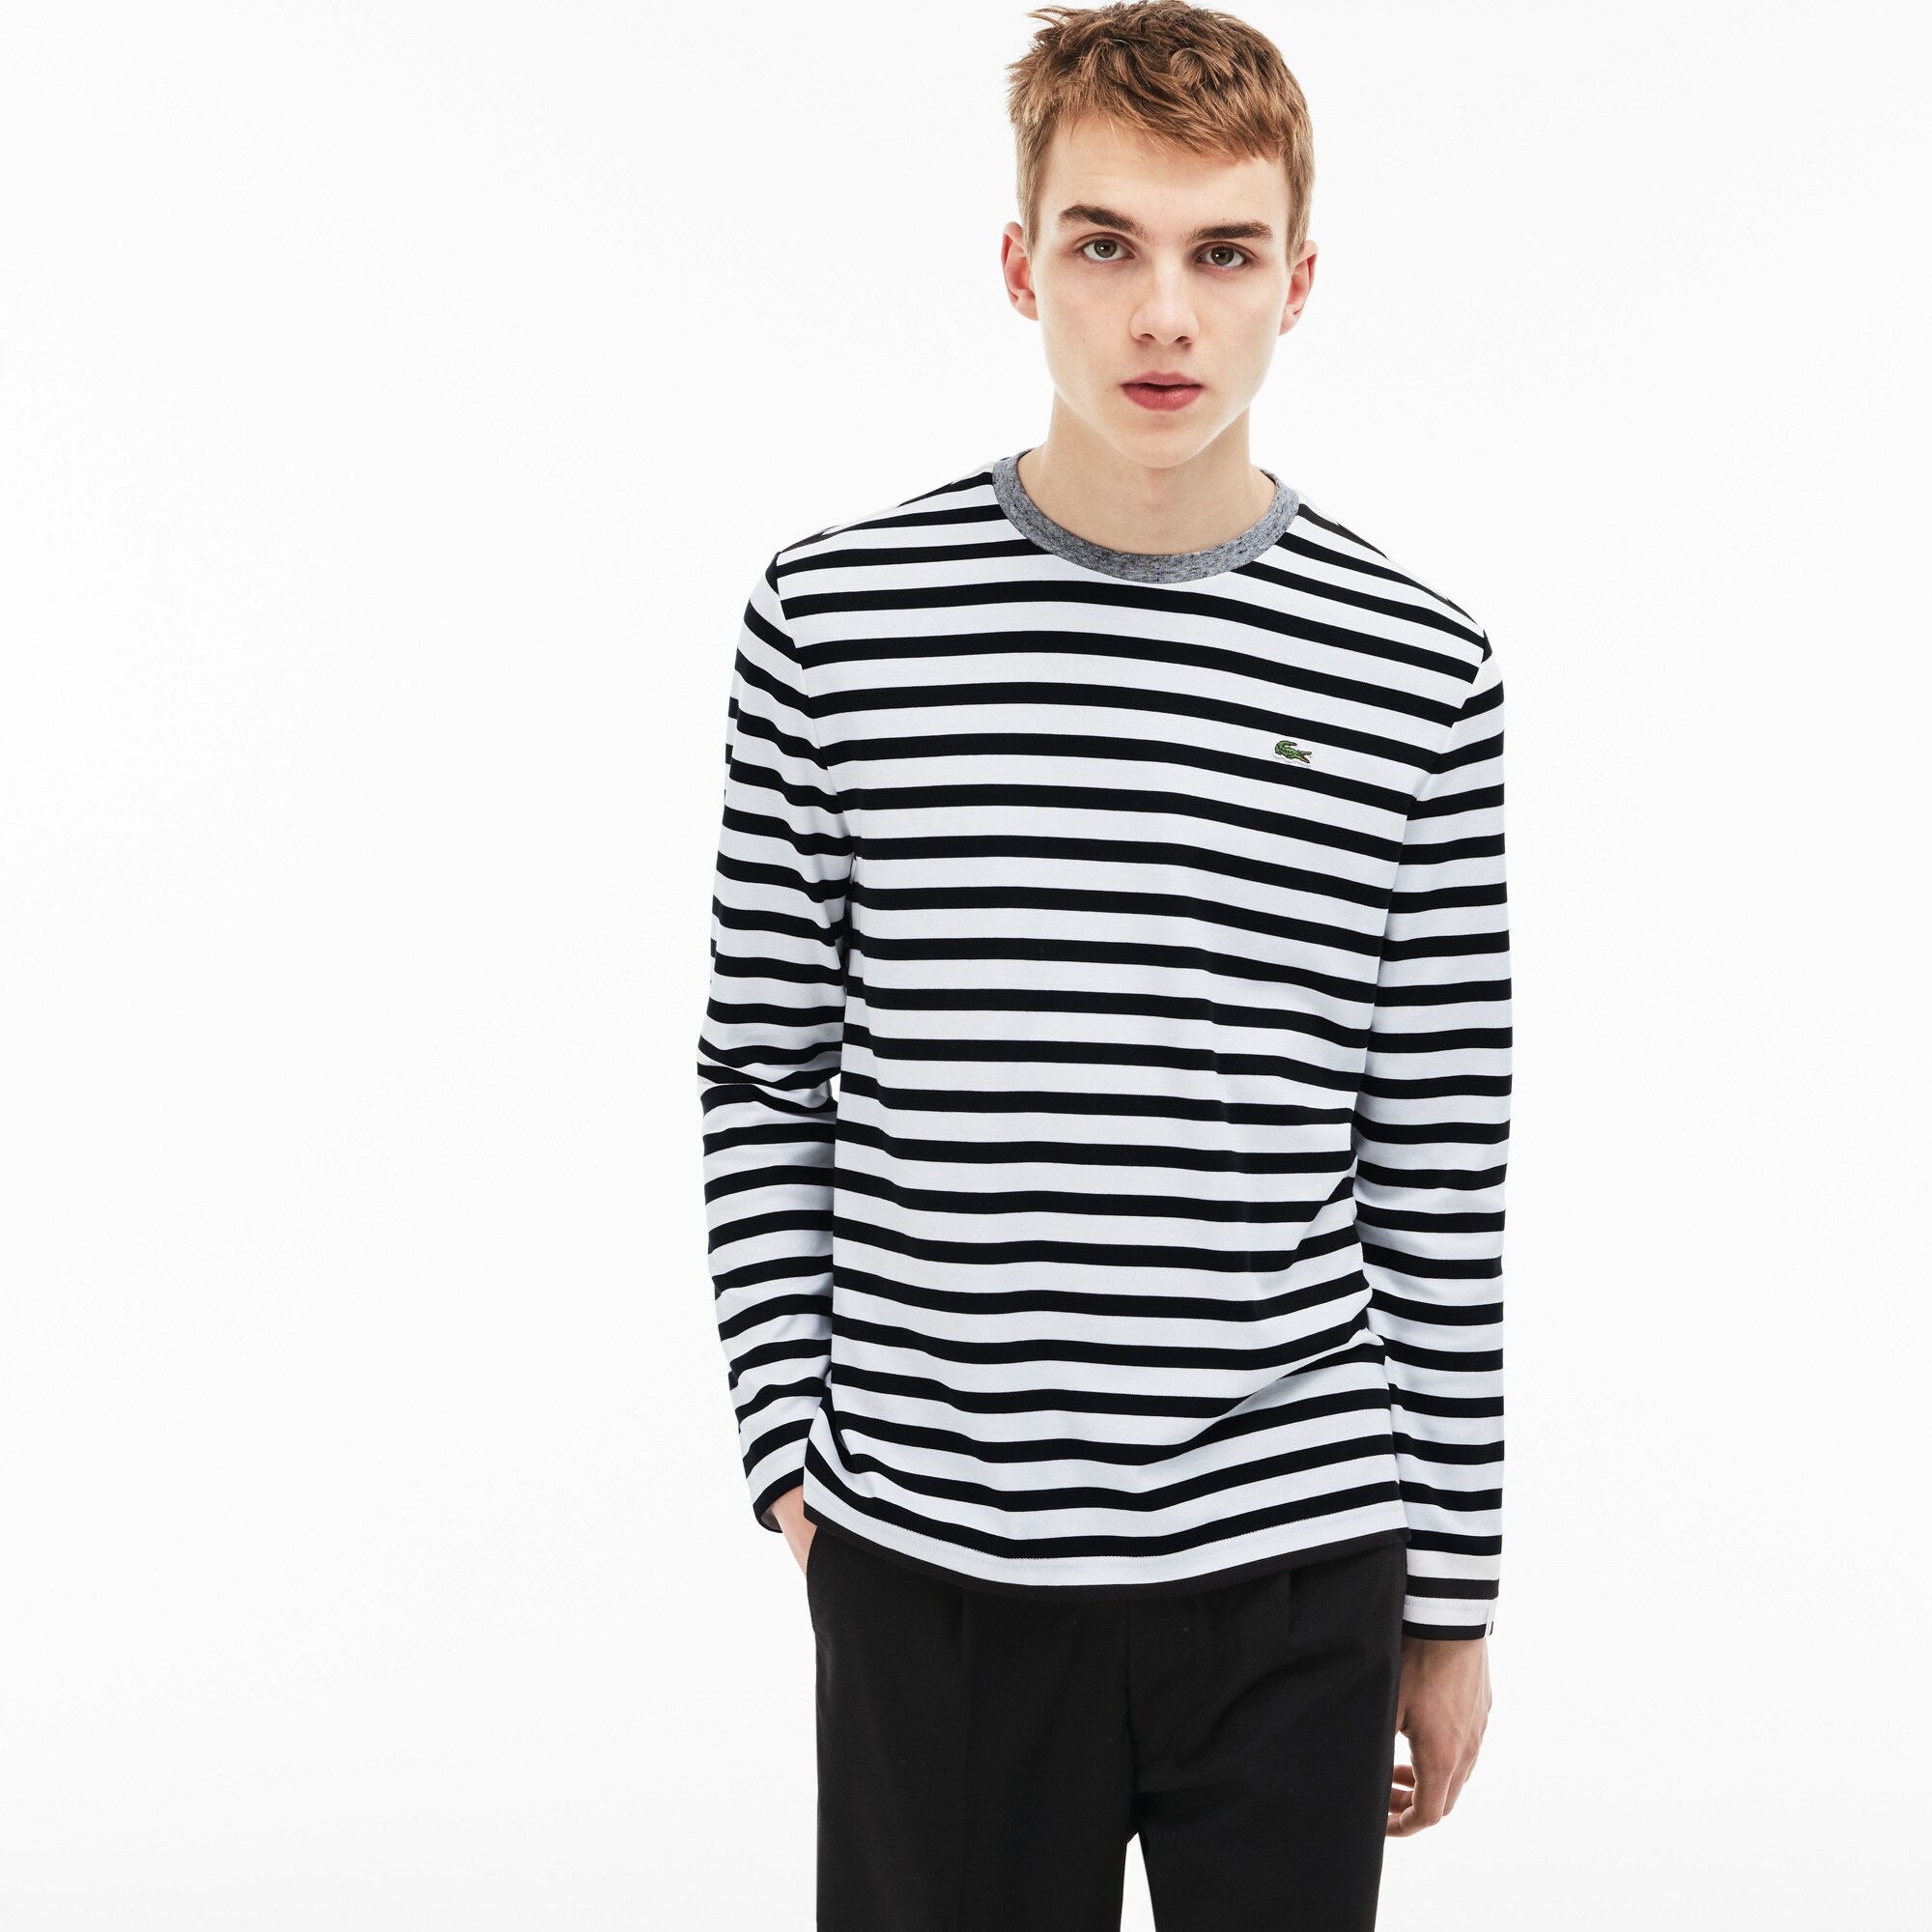 Men's Lacoste LIVE Contrast Collar Cotton Jersey Nautical Shirt